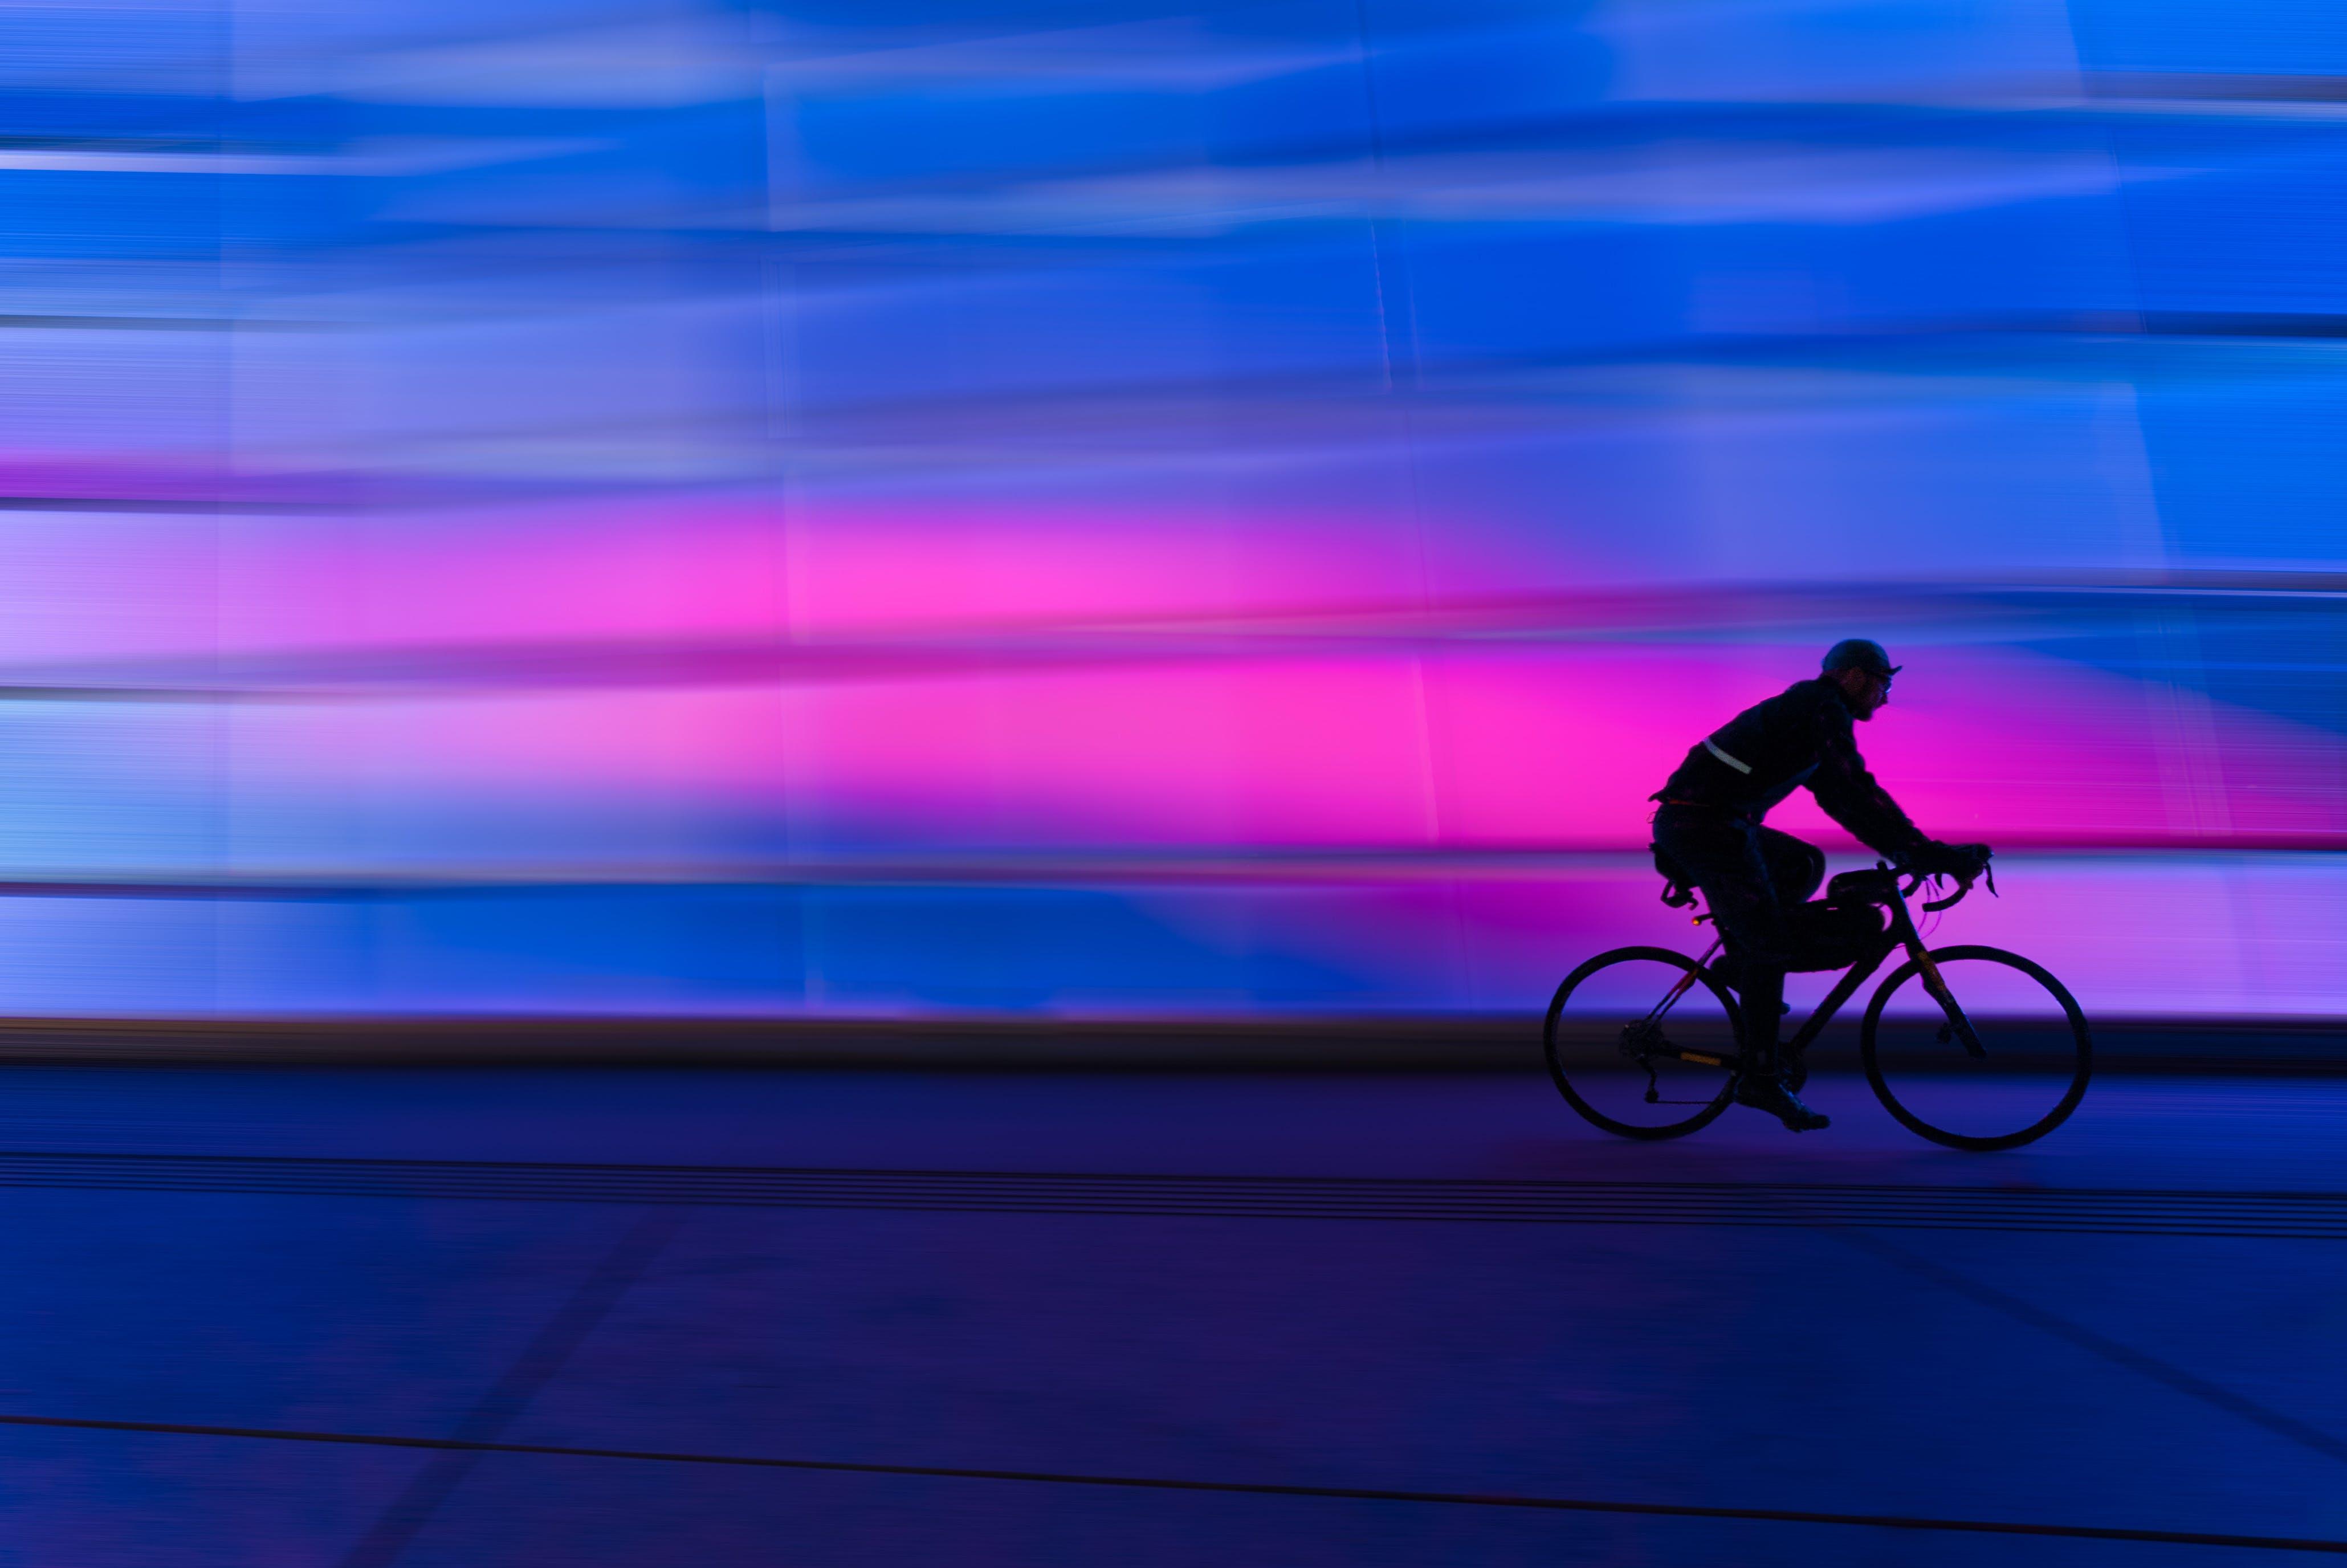 Gratis lagerfoto af cykel, cykelrytter, cykling, cyklist